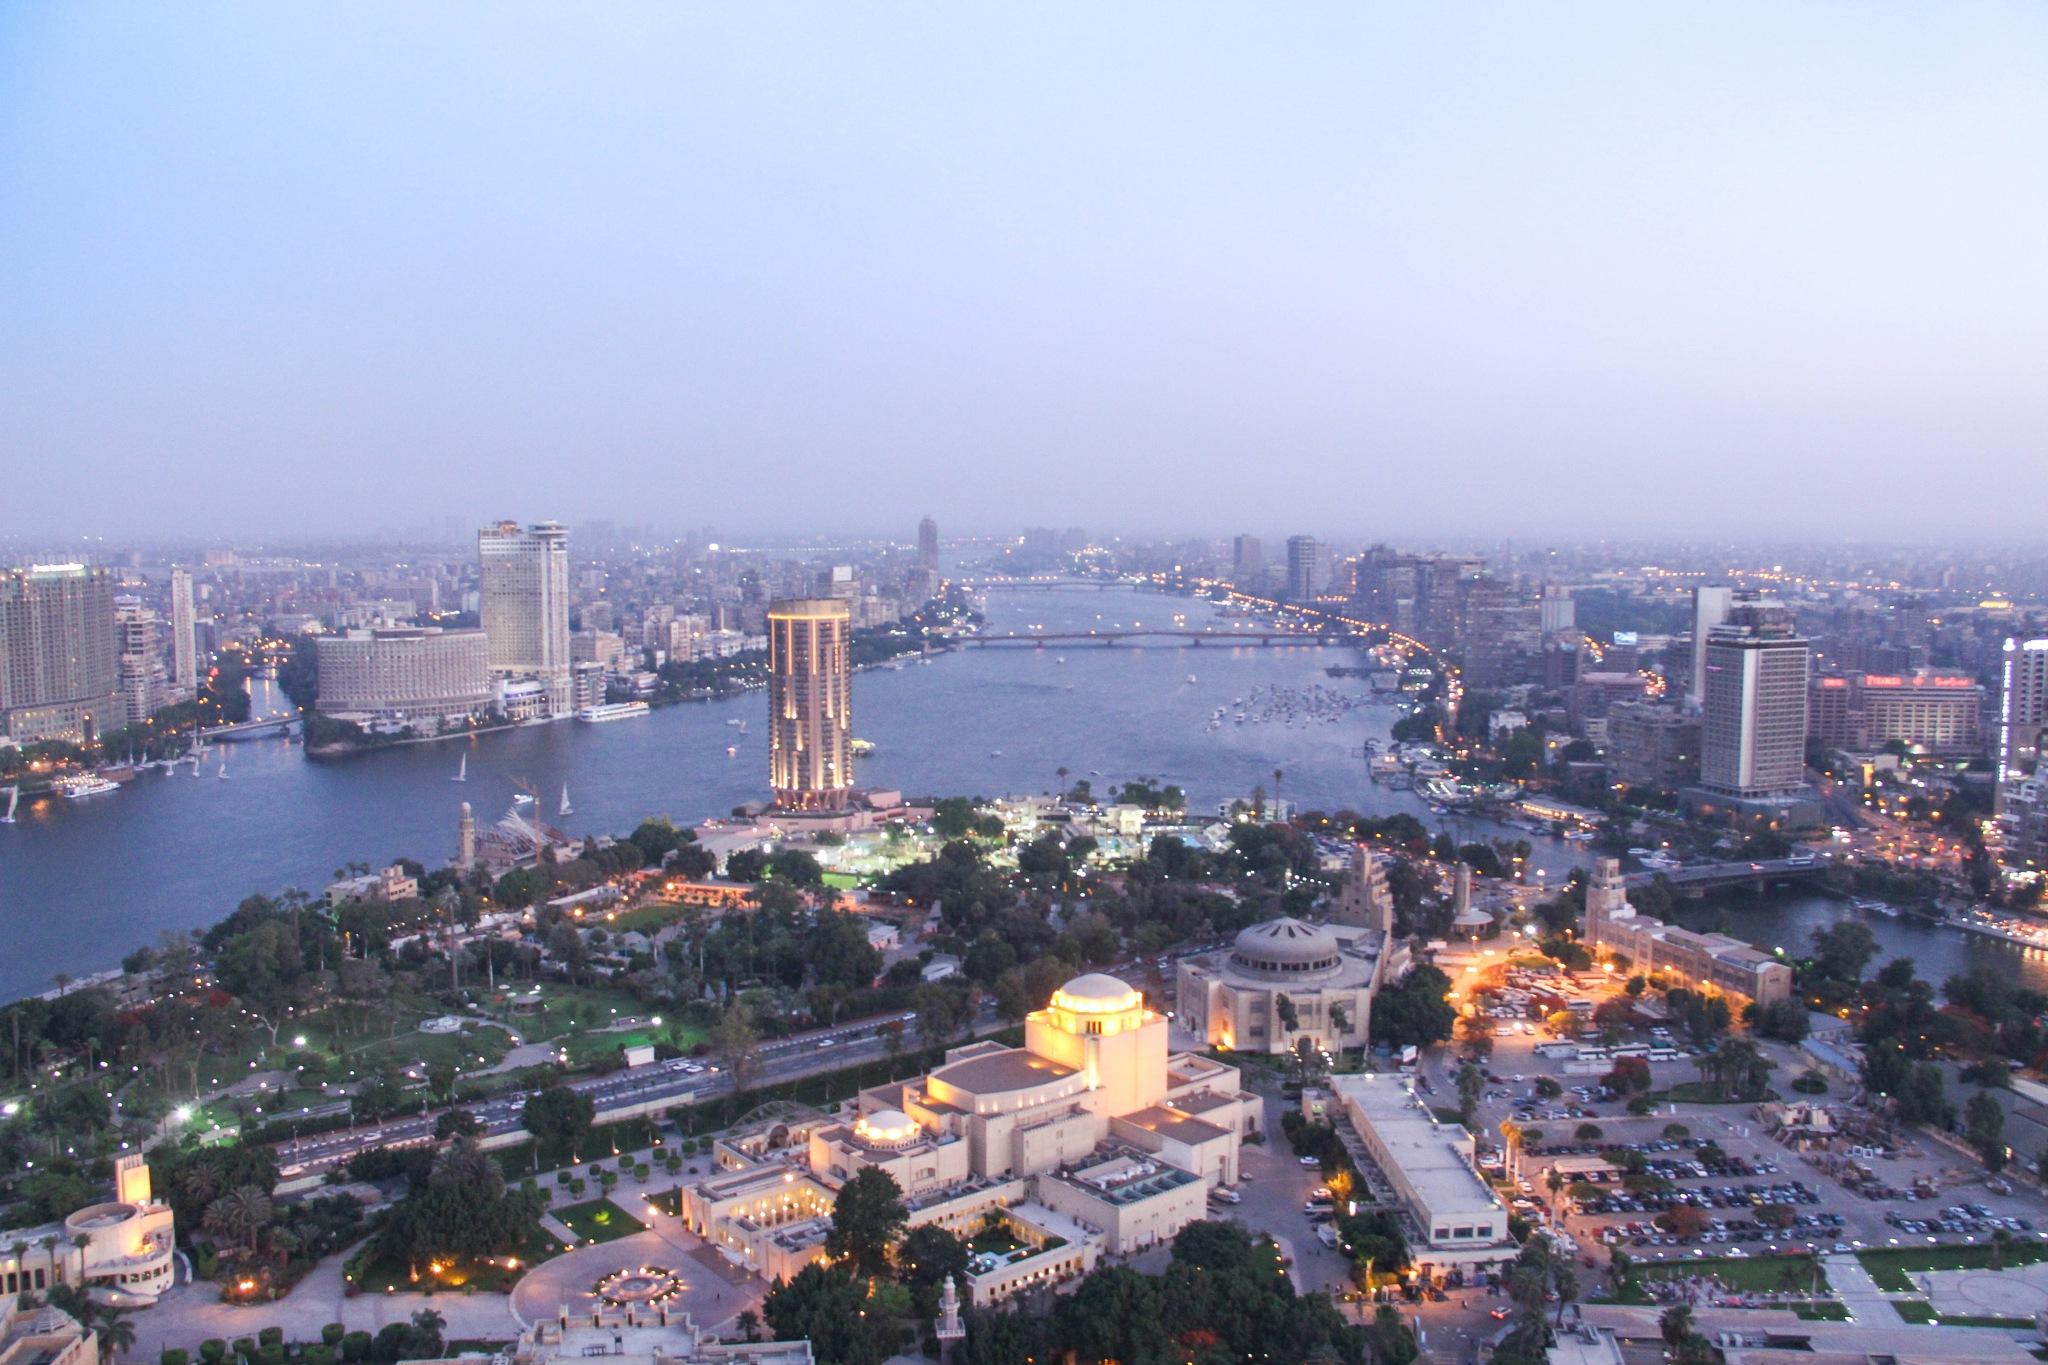 Cairo by hossam_kamal